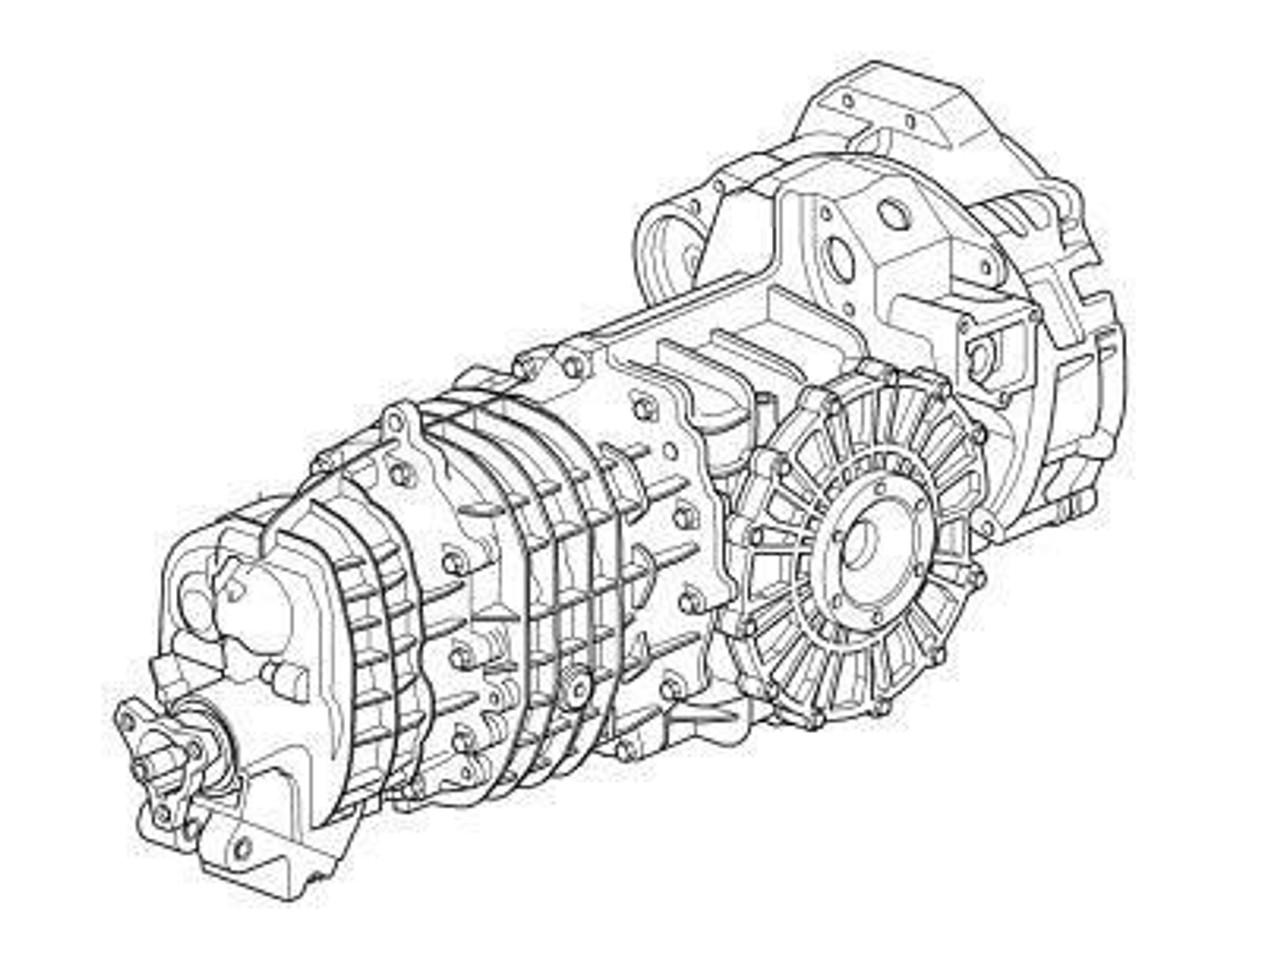 Porsche 911 997 6 Speed Twin Turbo Manual Gearbox